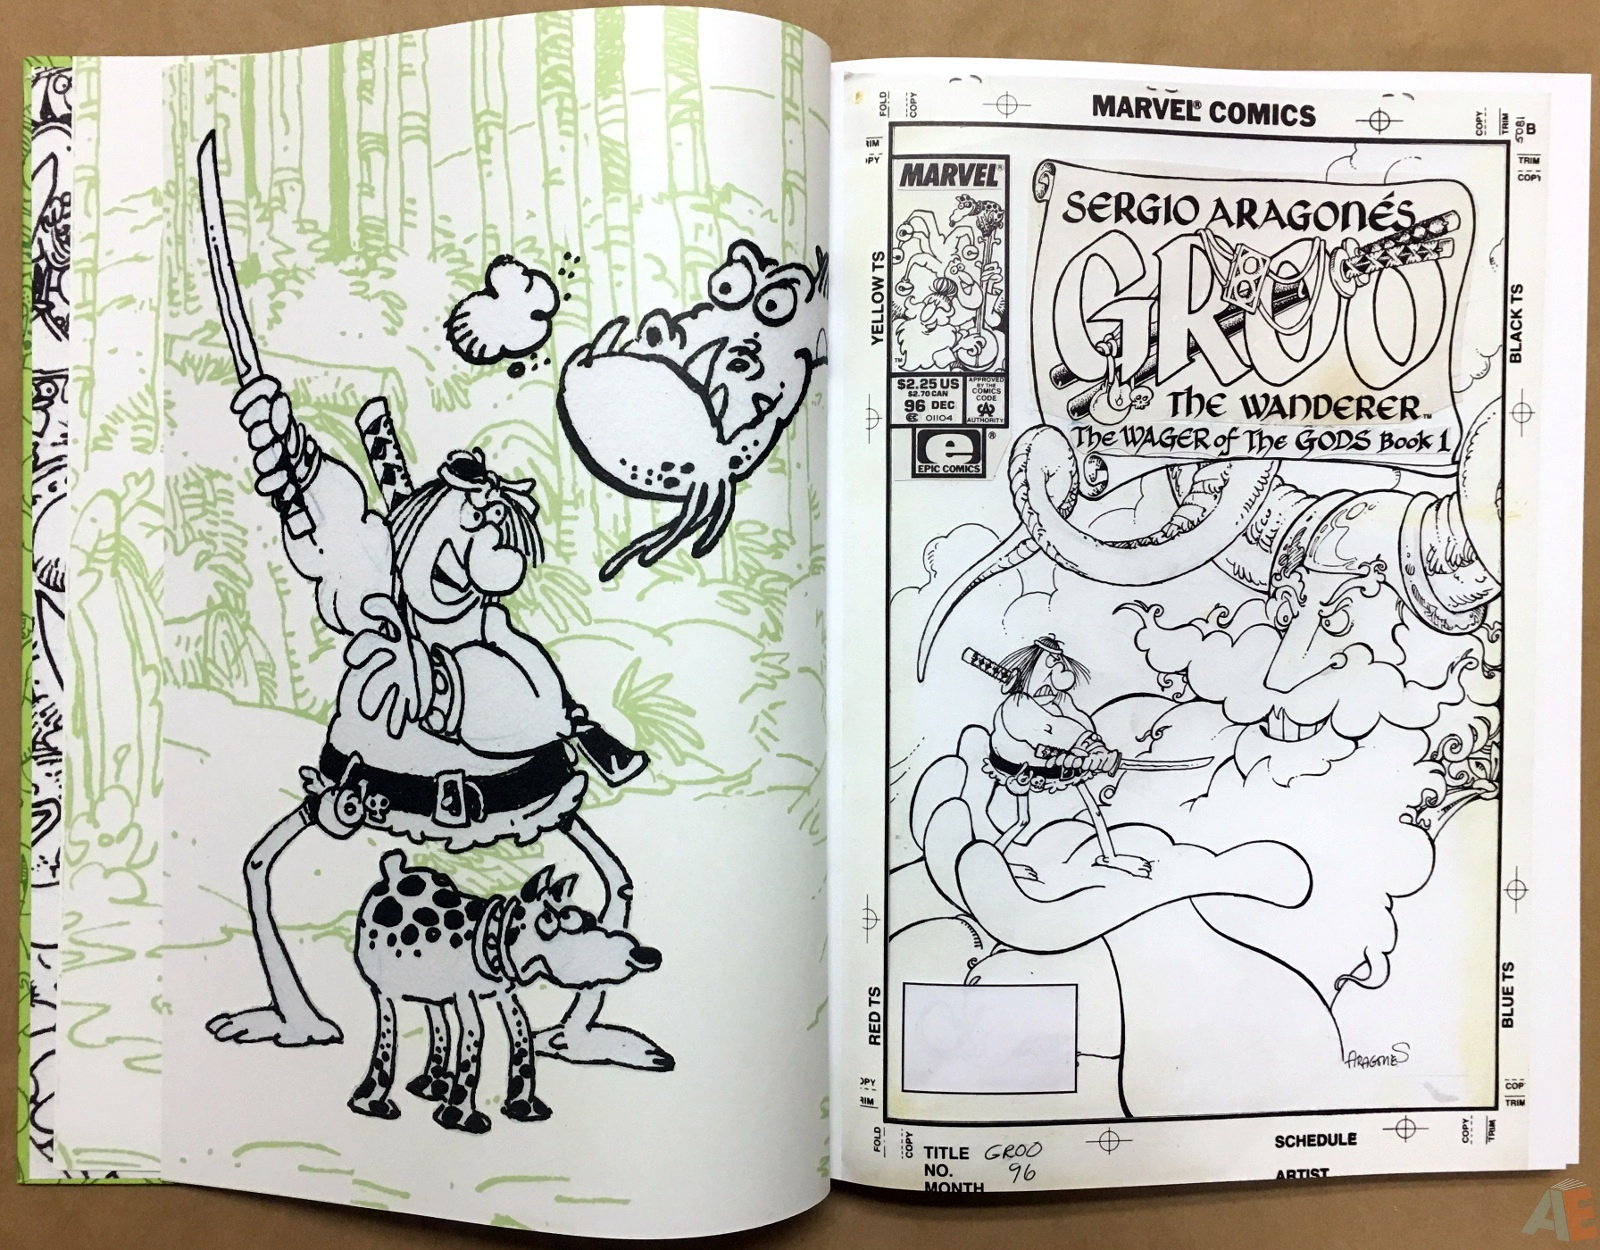 Sergio Aragonés Groo The Wanderer Artist's Edition 10